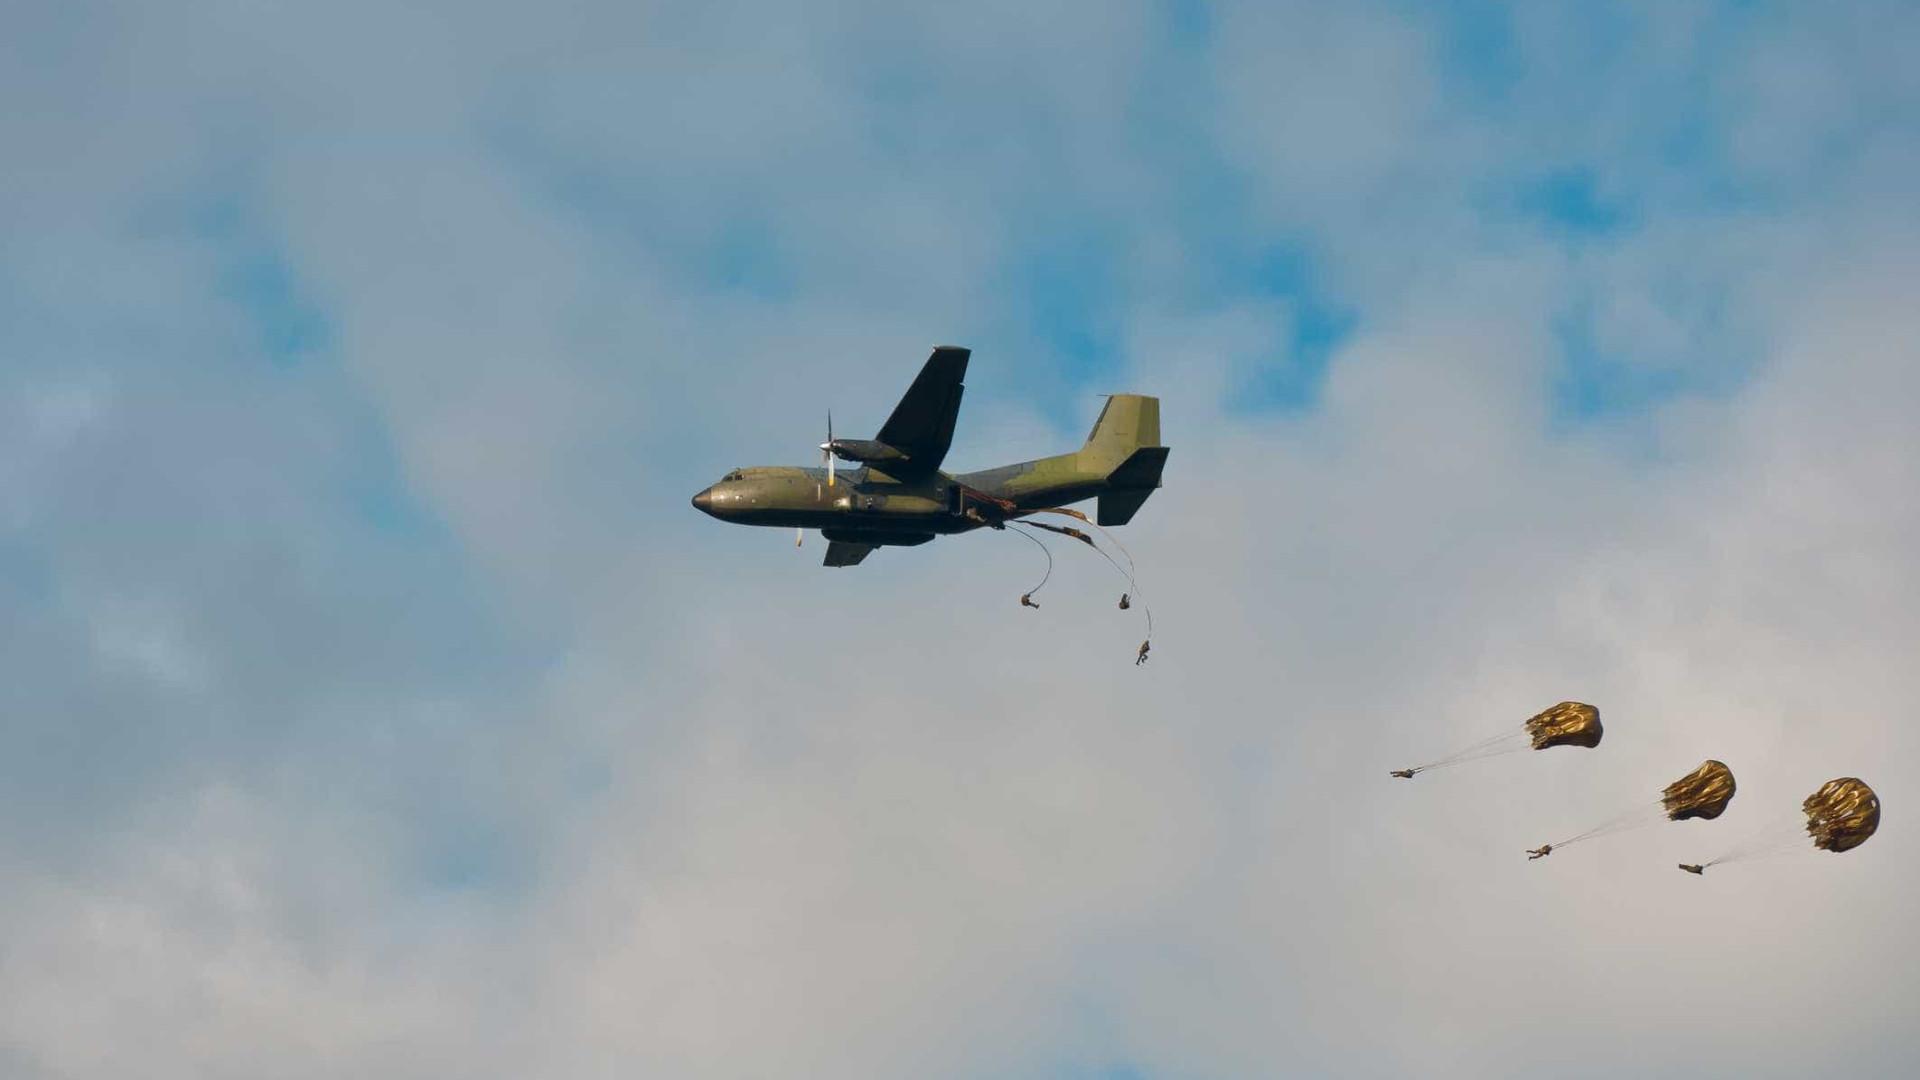 Paraquedista internado na quinta apresenta prognóstico muito favorável